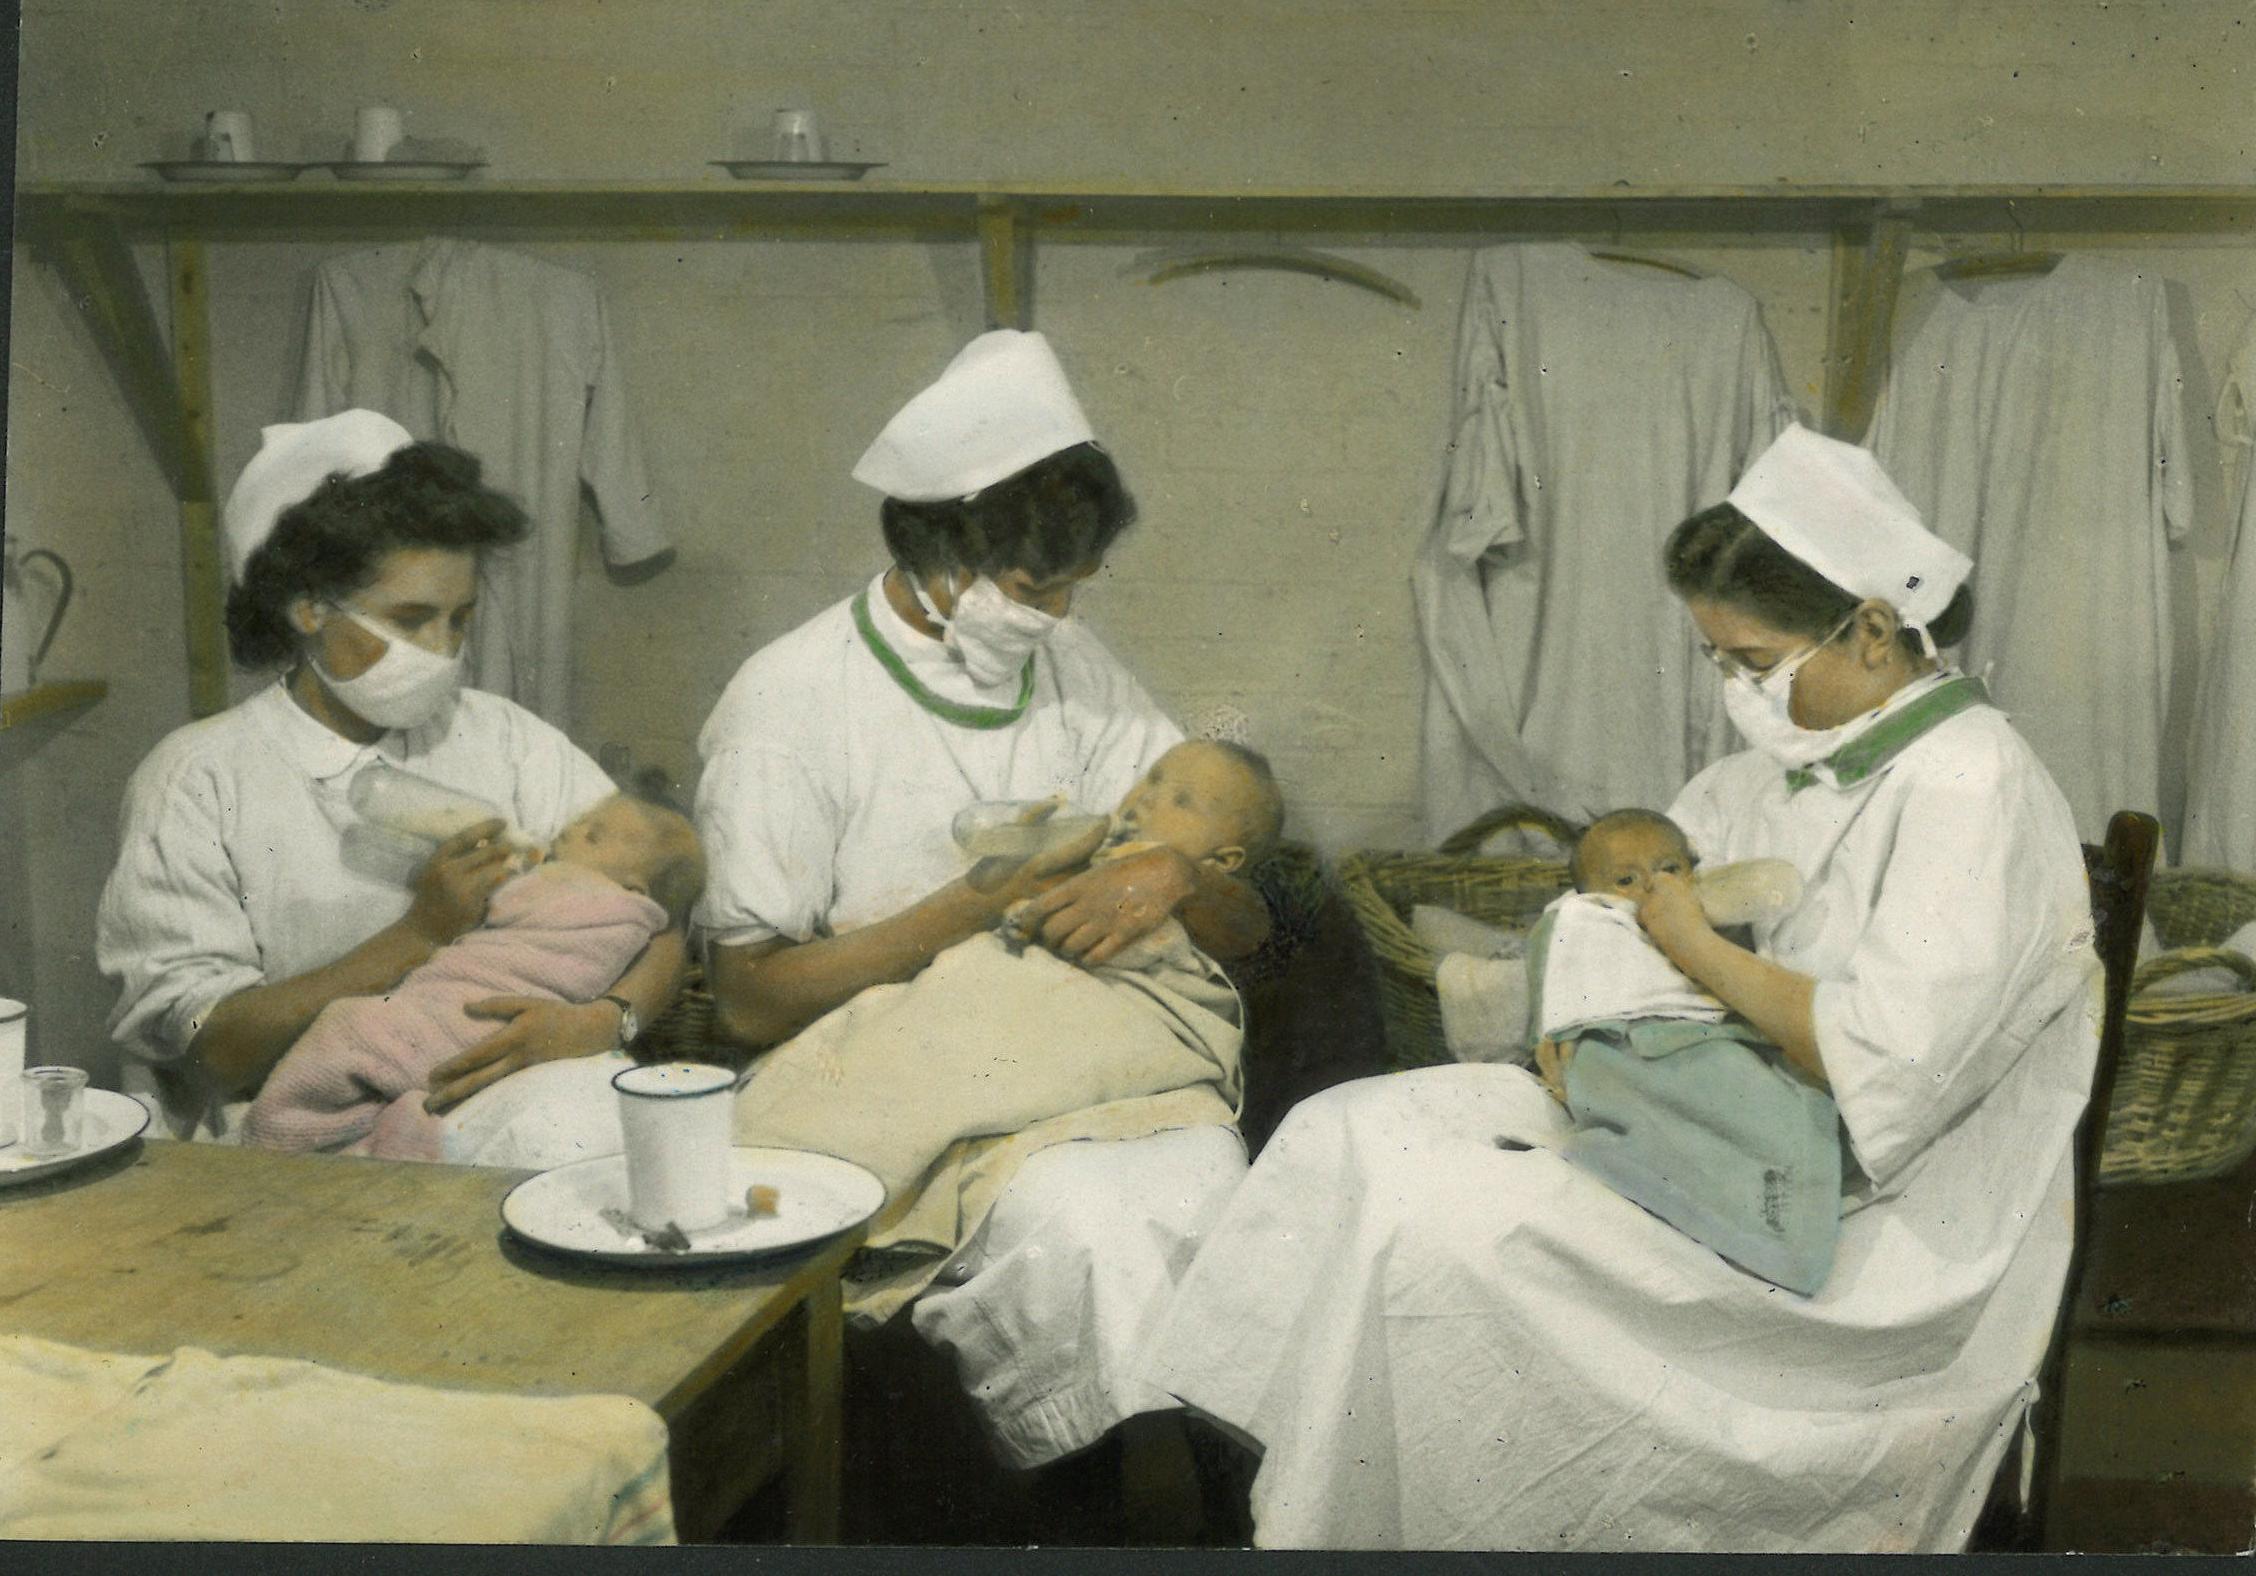 Nurses bottle-feeding infants, 1940s